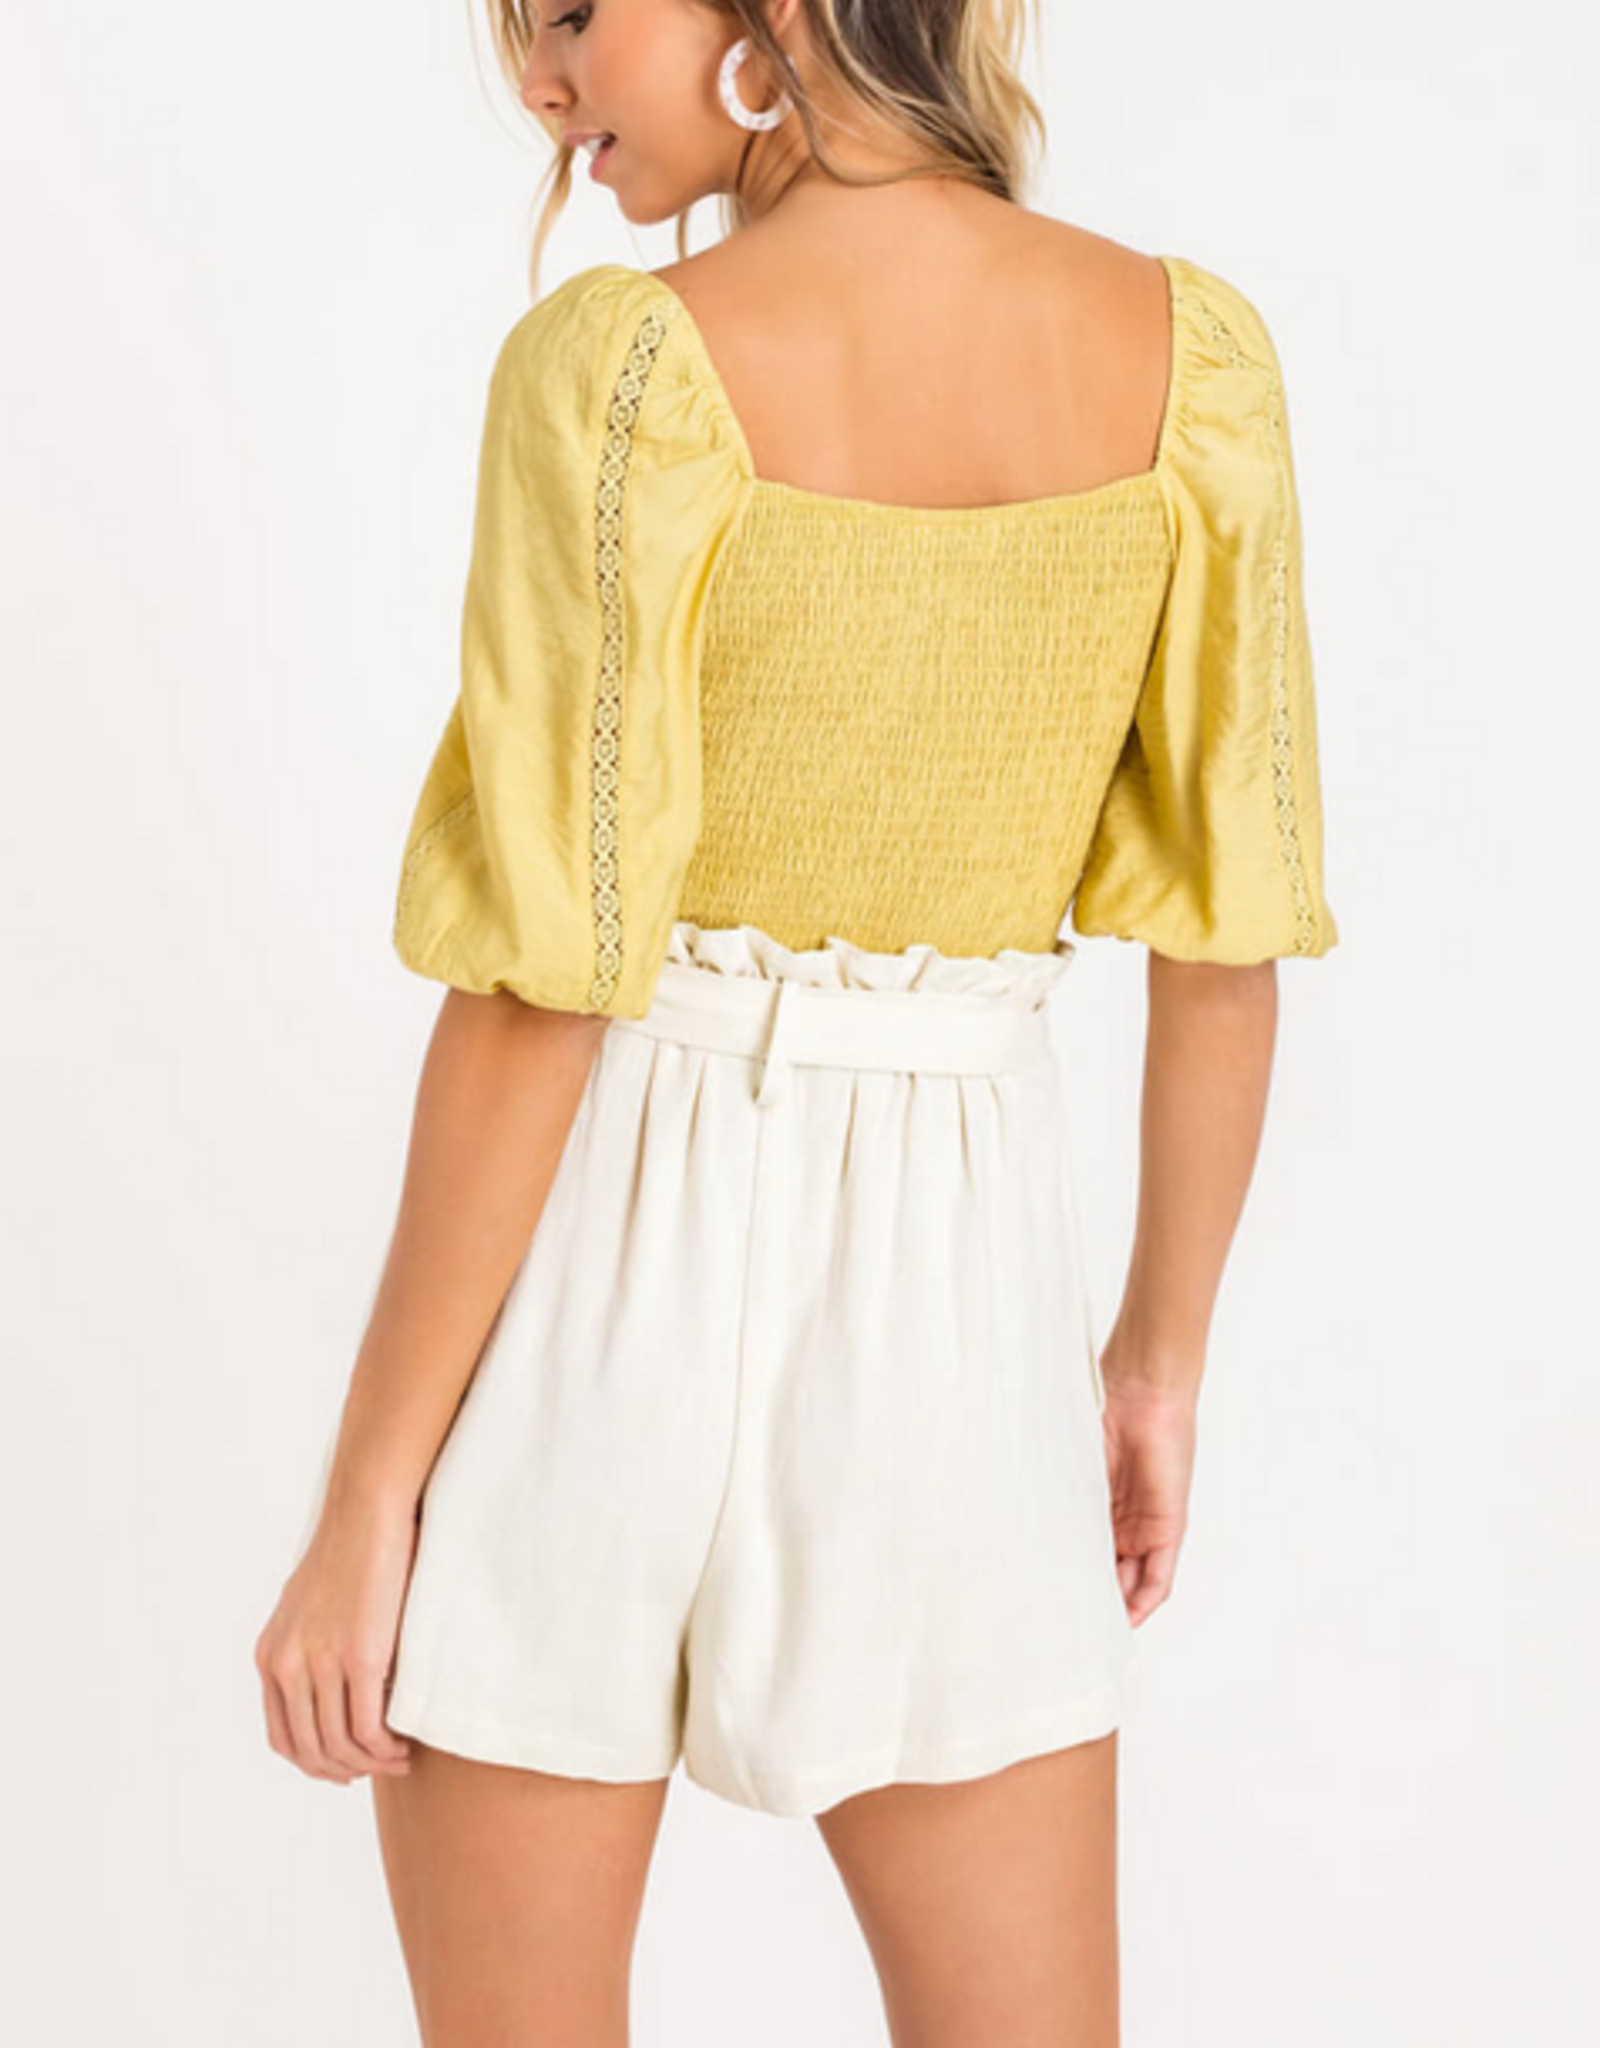 Lush Lace Button Crop Top